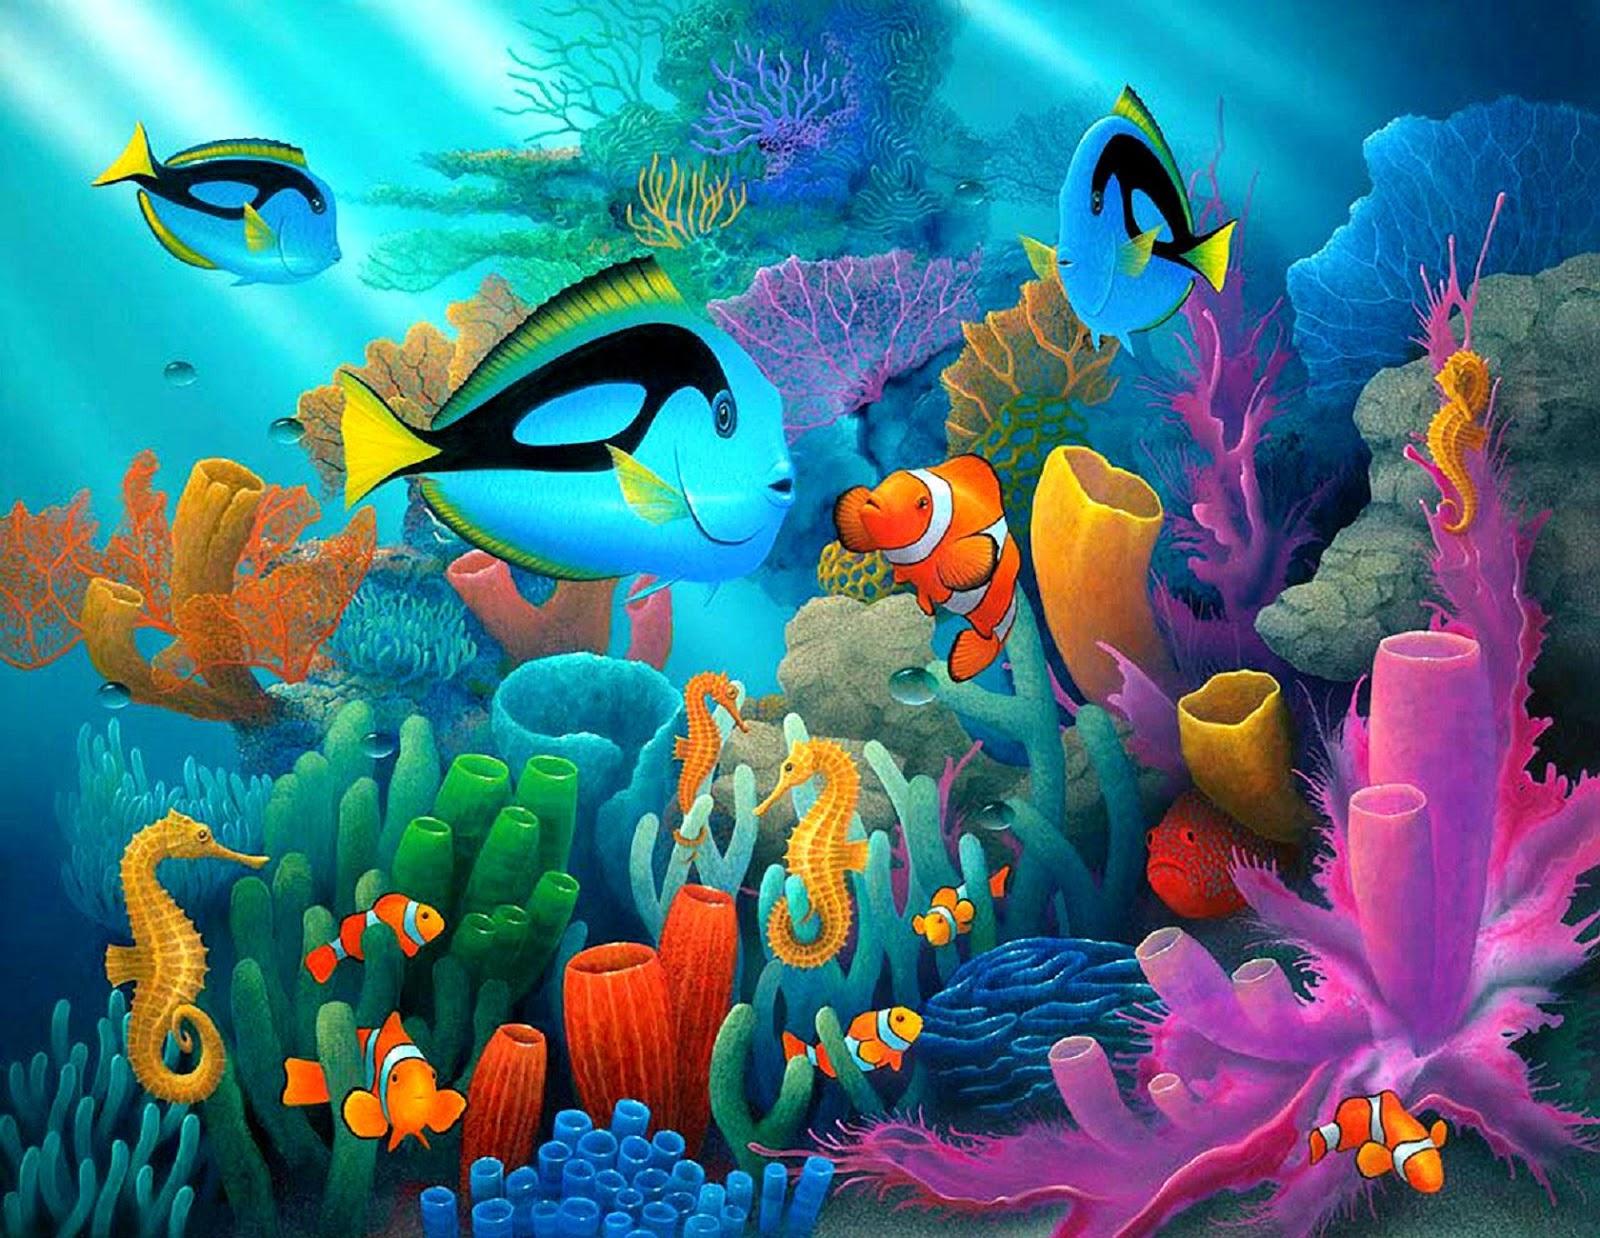 underwater world desktop backgroundsbeautiful underwater world hd wallpapers underwater world desktop backgrounds free download underwater photography